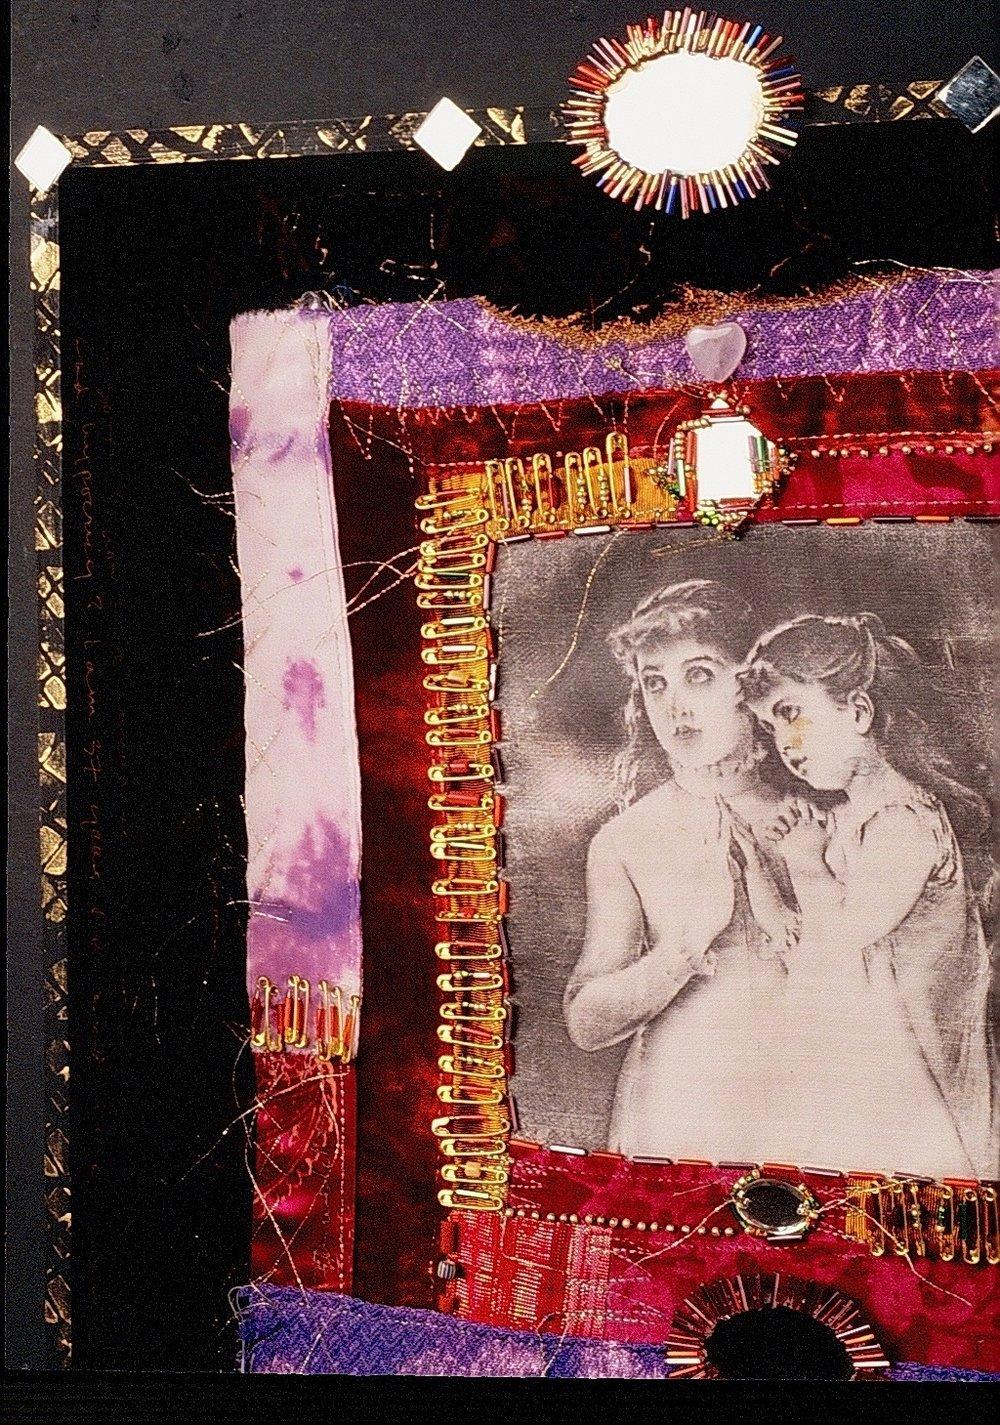 Goddess II: Sisters - Detail